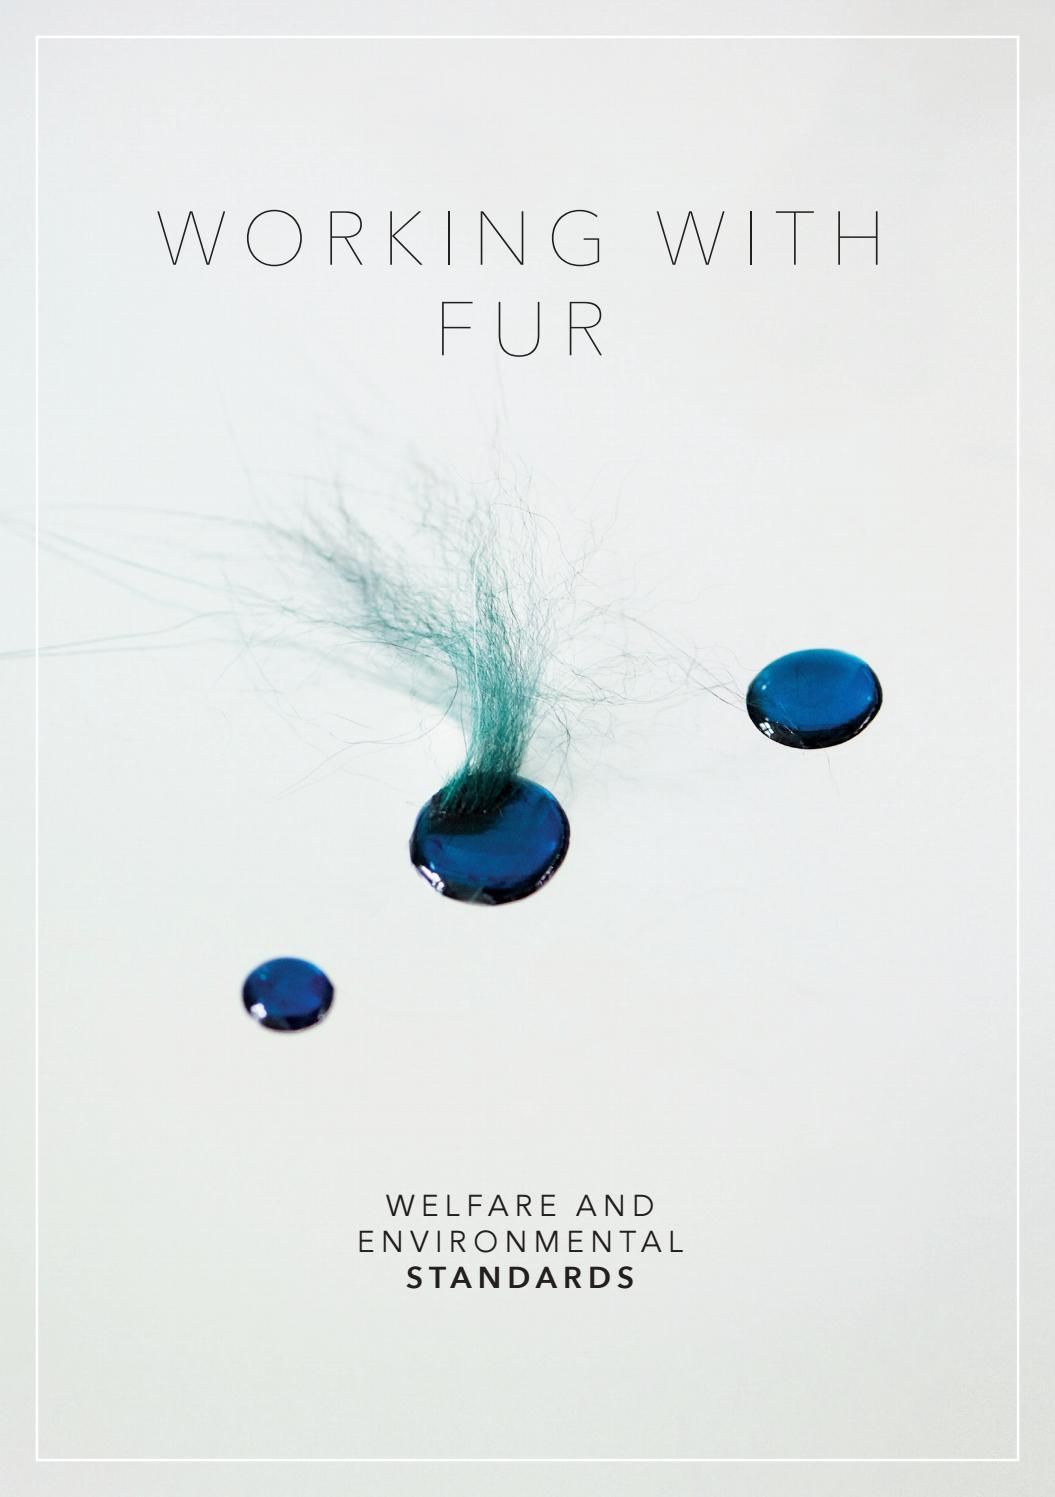 aa7827f3022 Working with fur by wearefur - issuu